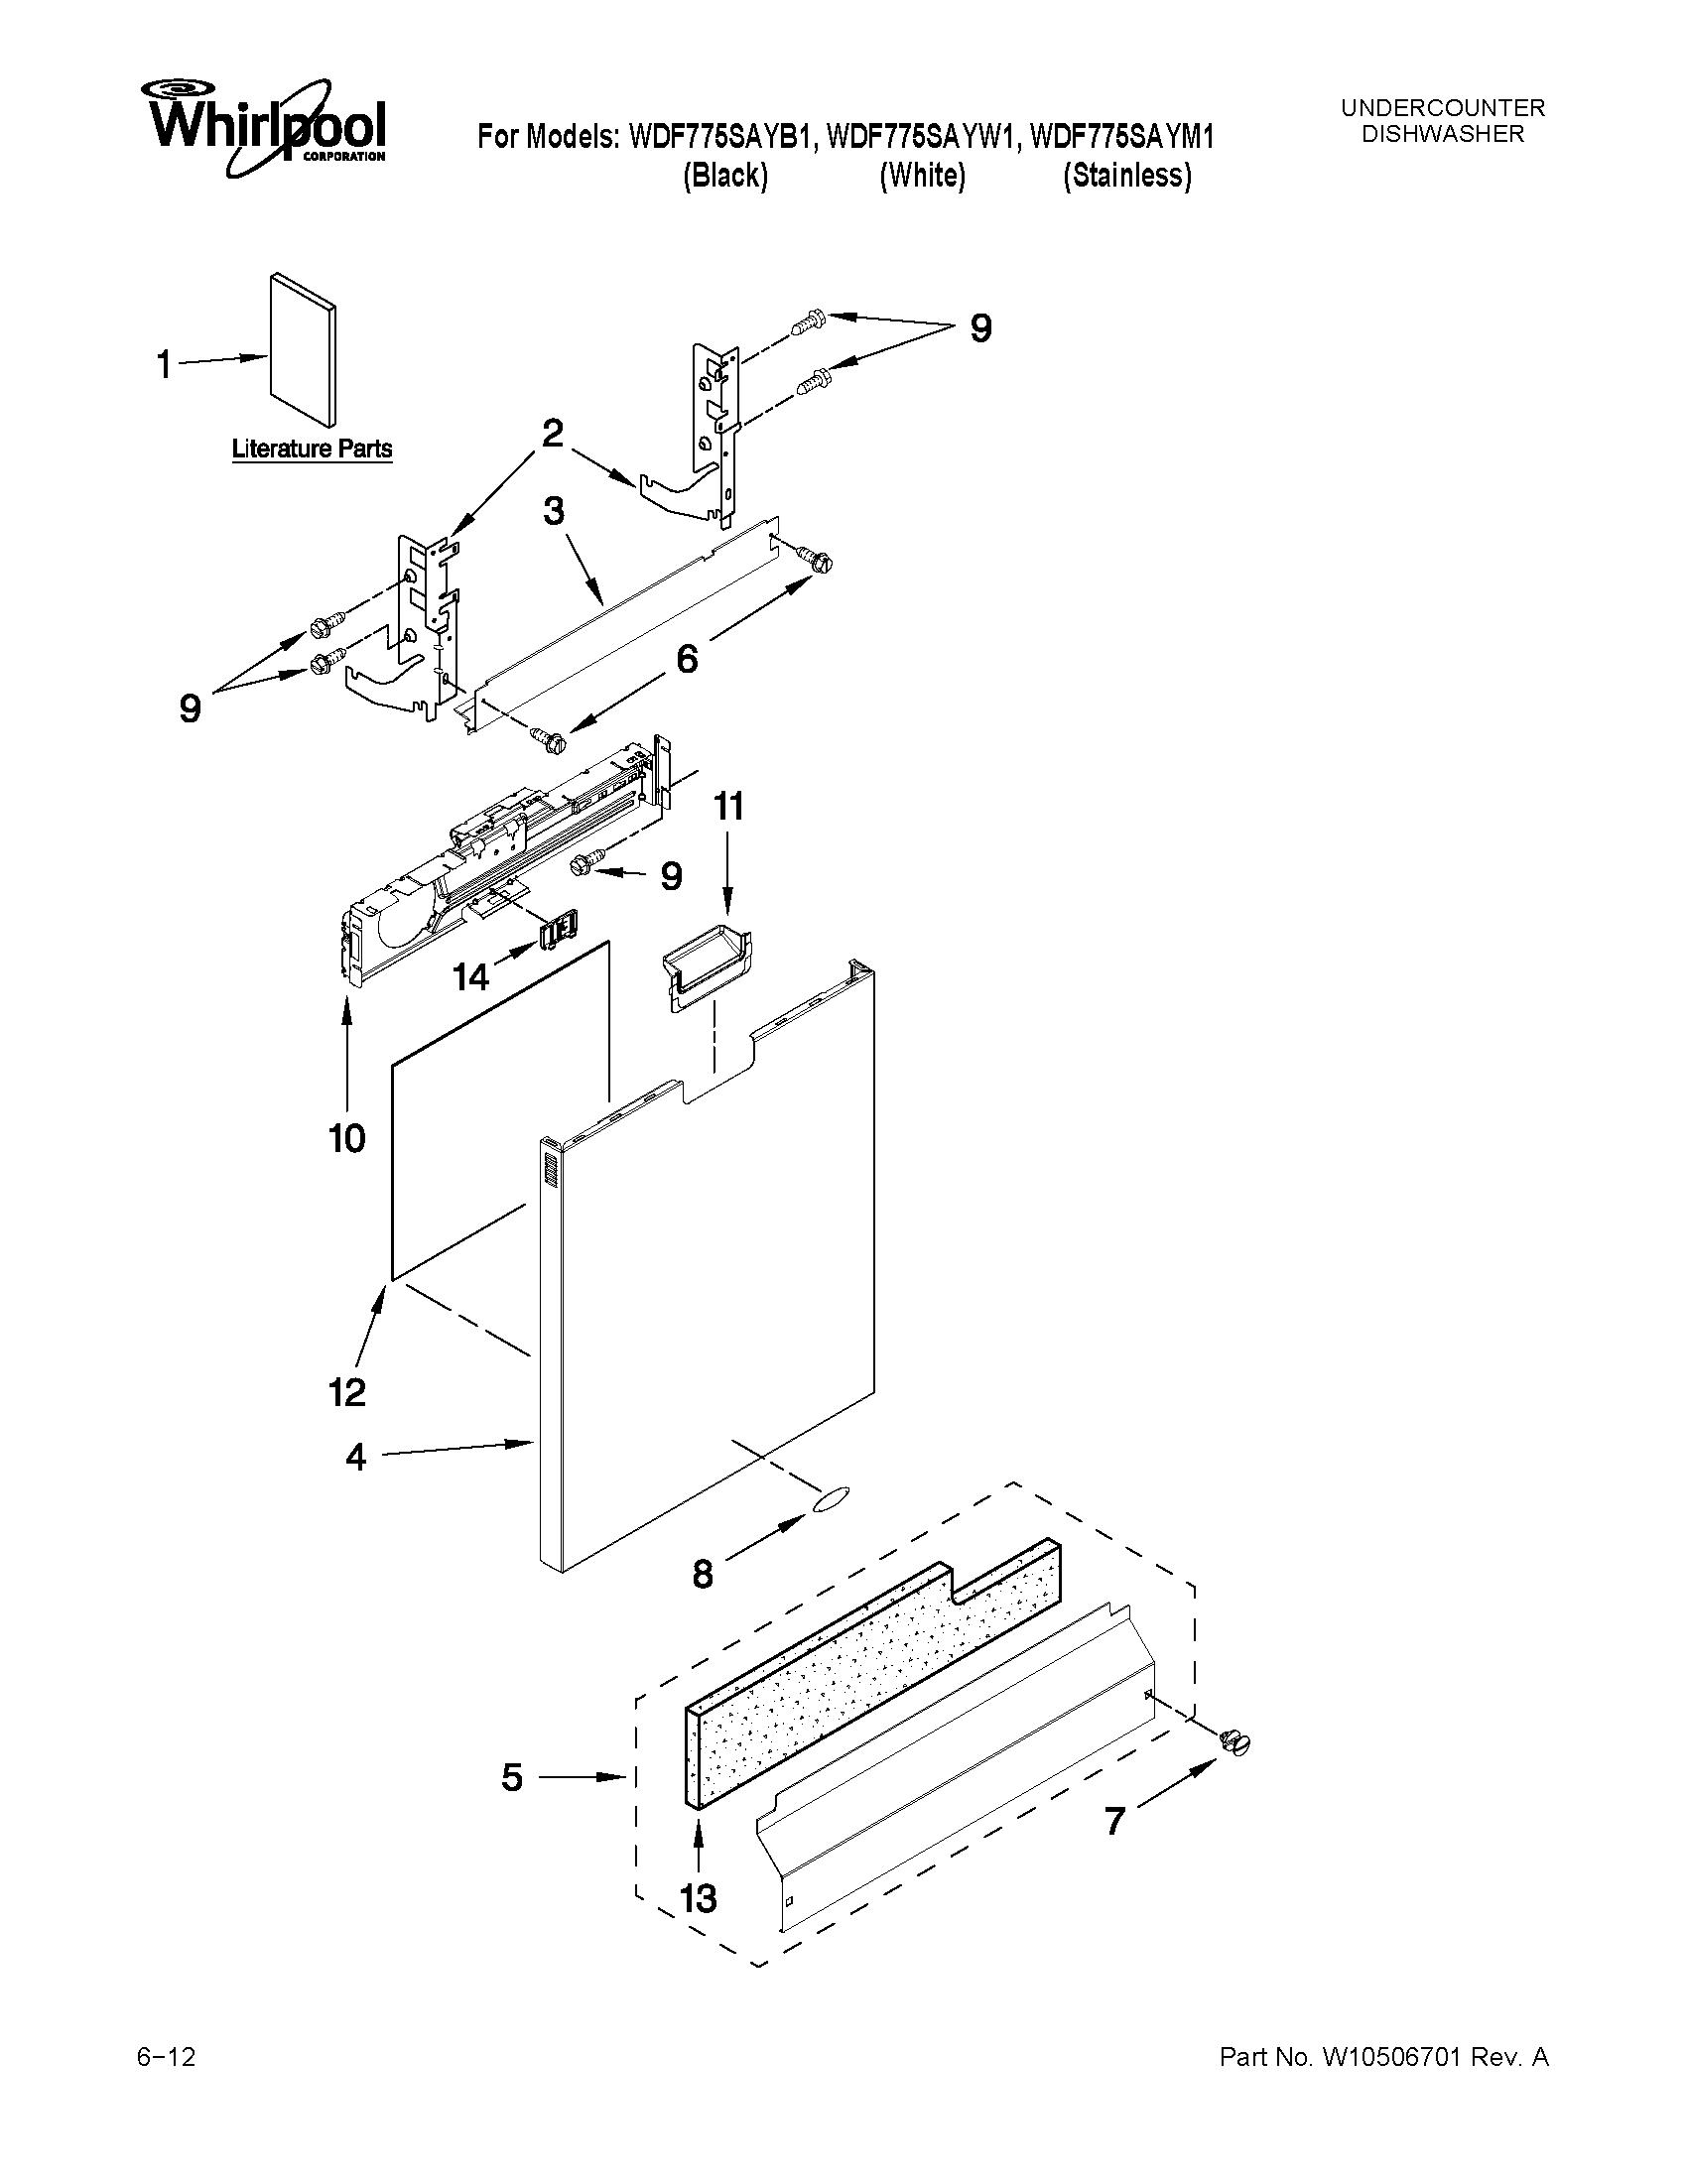 Whirlpool model WDF775SAYB1 dishwasher genuine parts